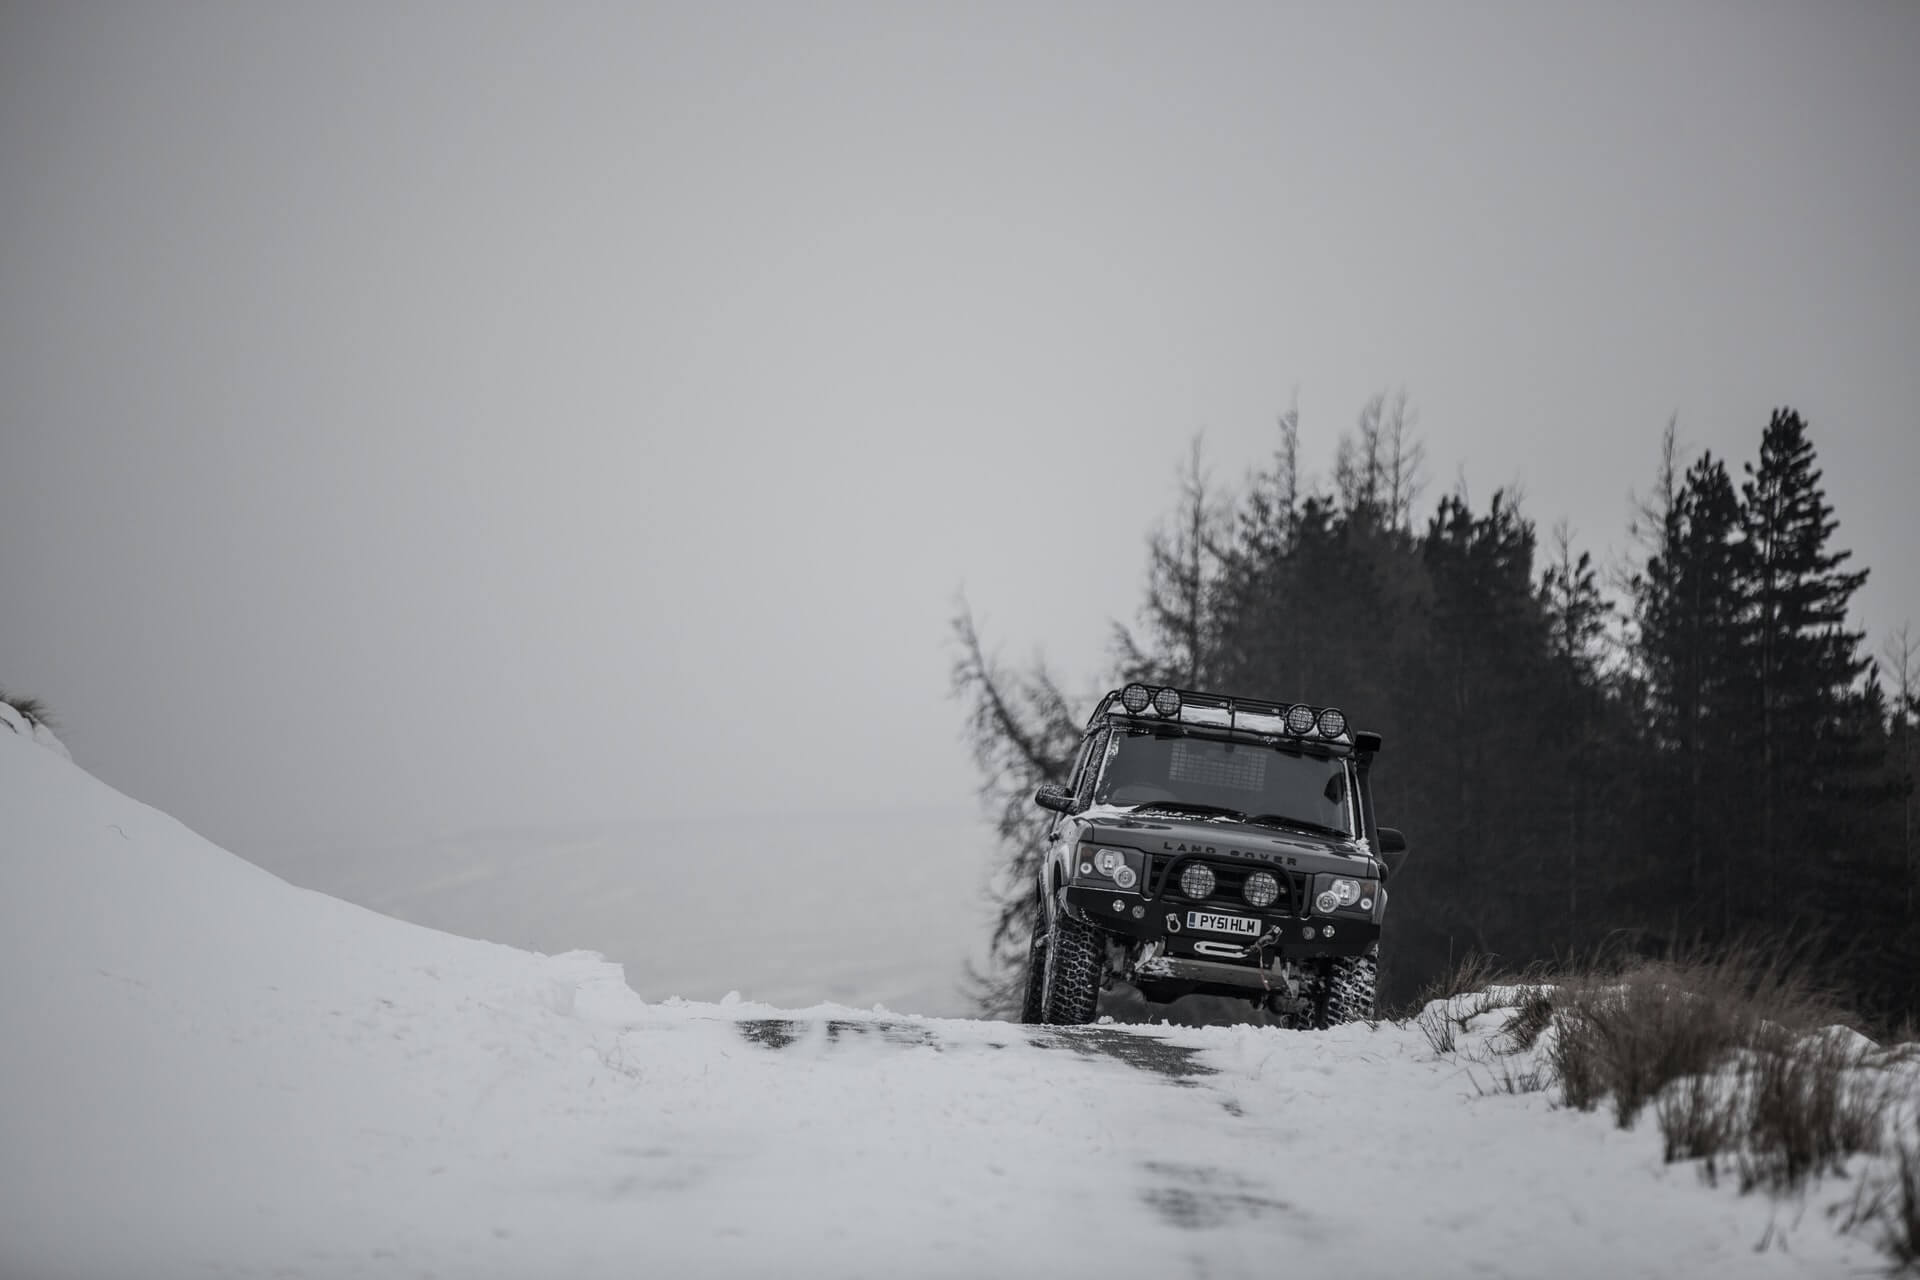 Black SUV in snowy terrain.